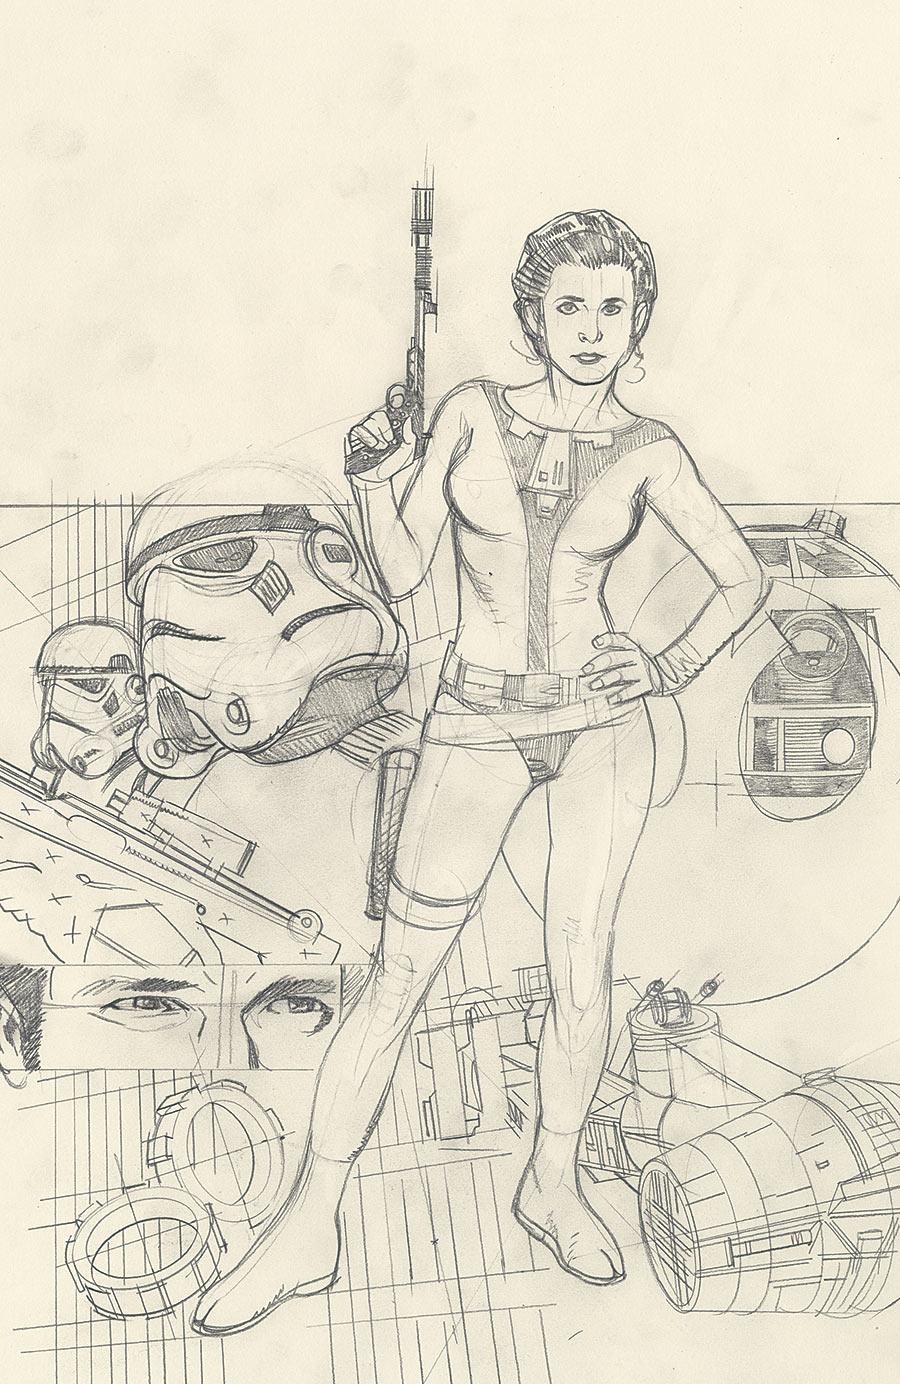 Rebel Heist #2 Adam Hughes Ultra Variant Sketch Cover (28.05.2014)